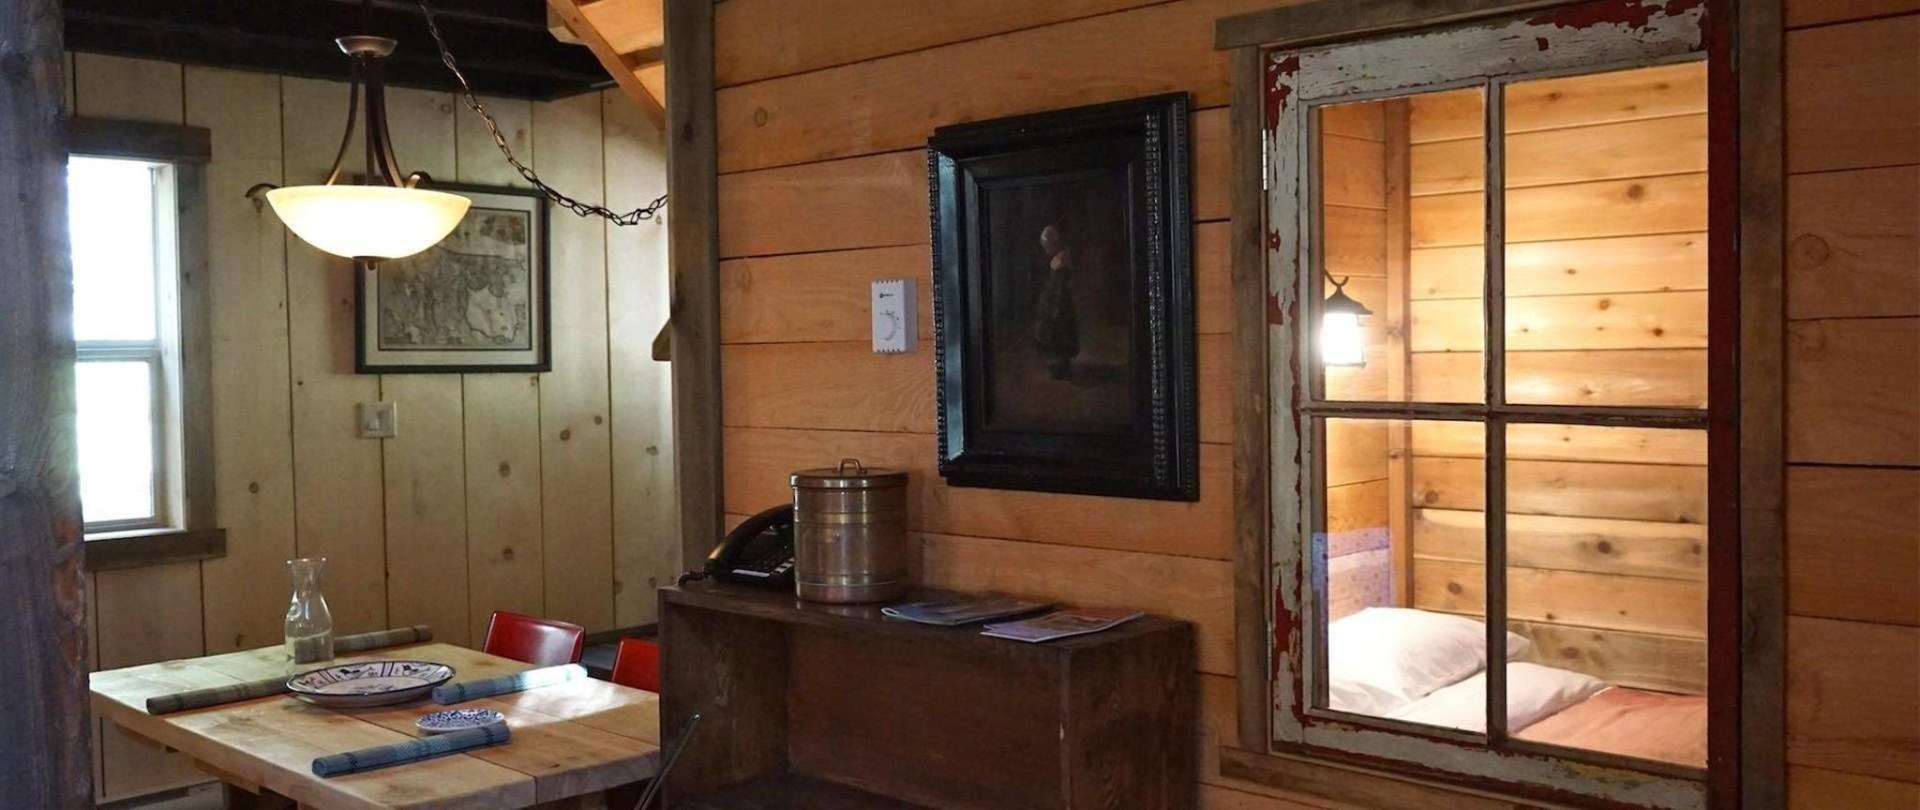 heritage-cabin.JPG.1920x810_0_52_10000.jpeg